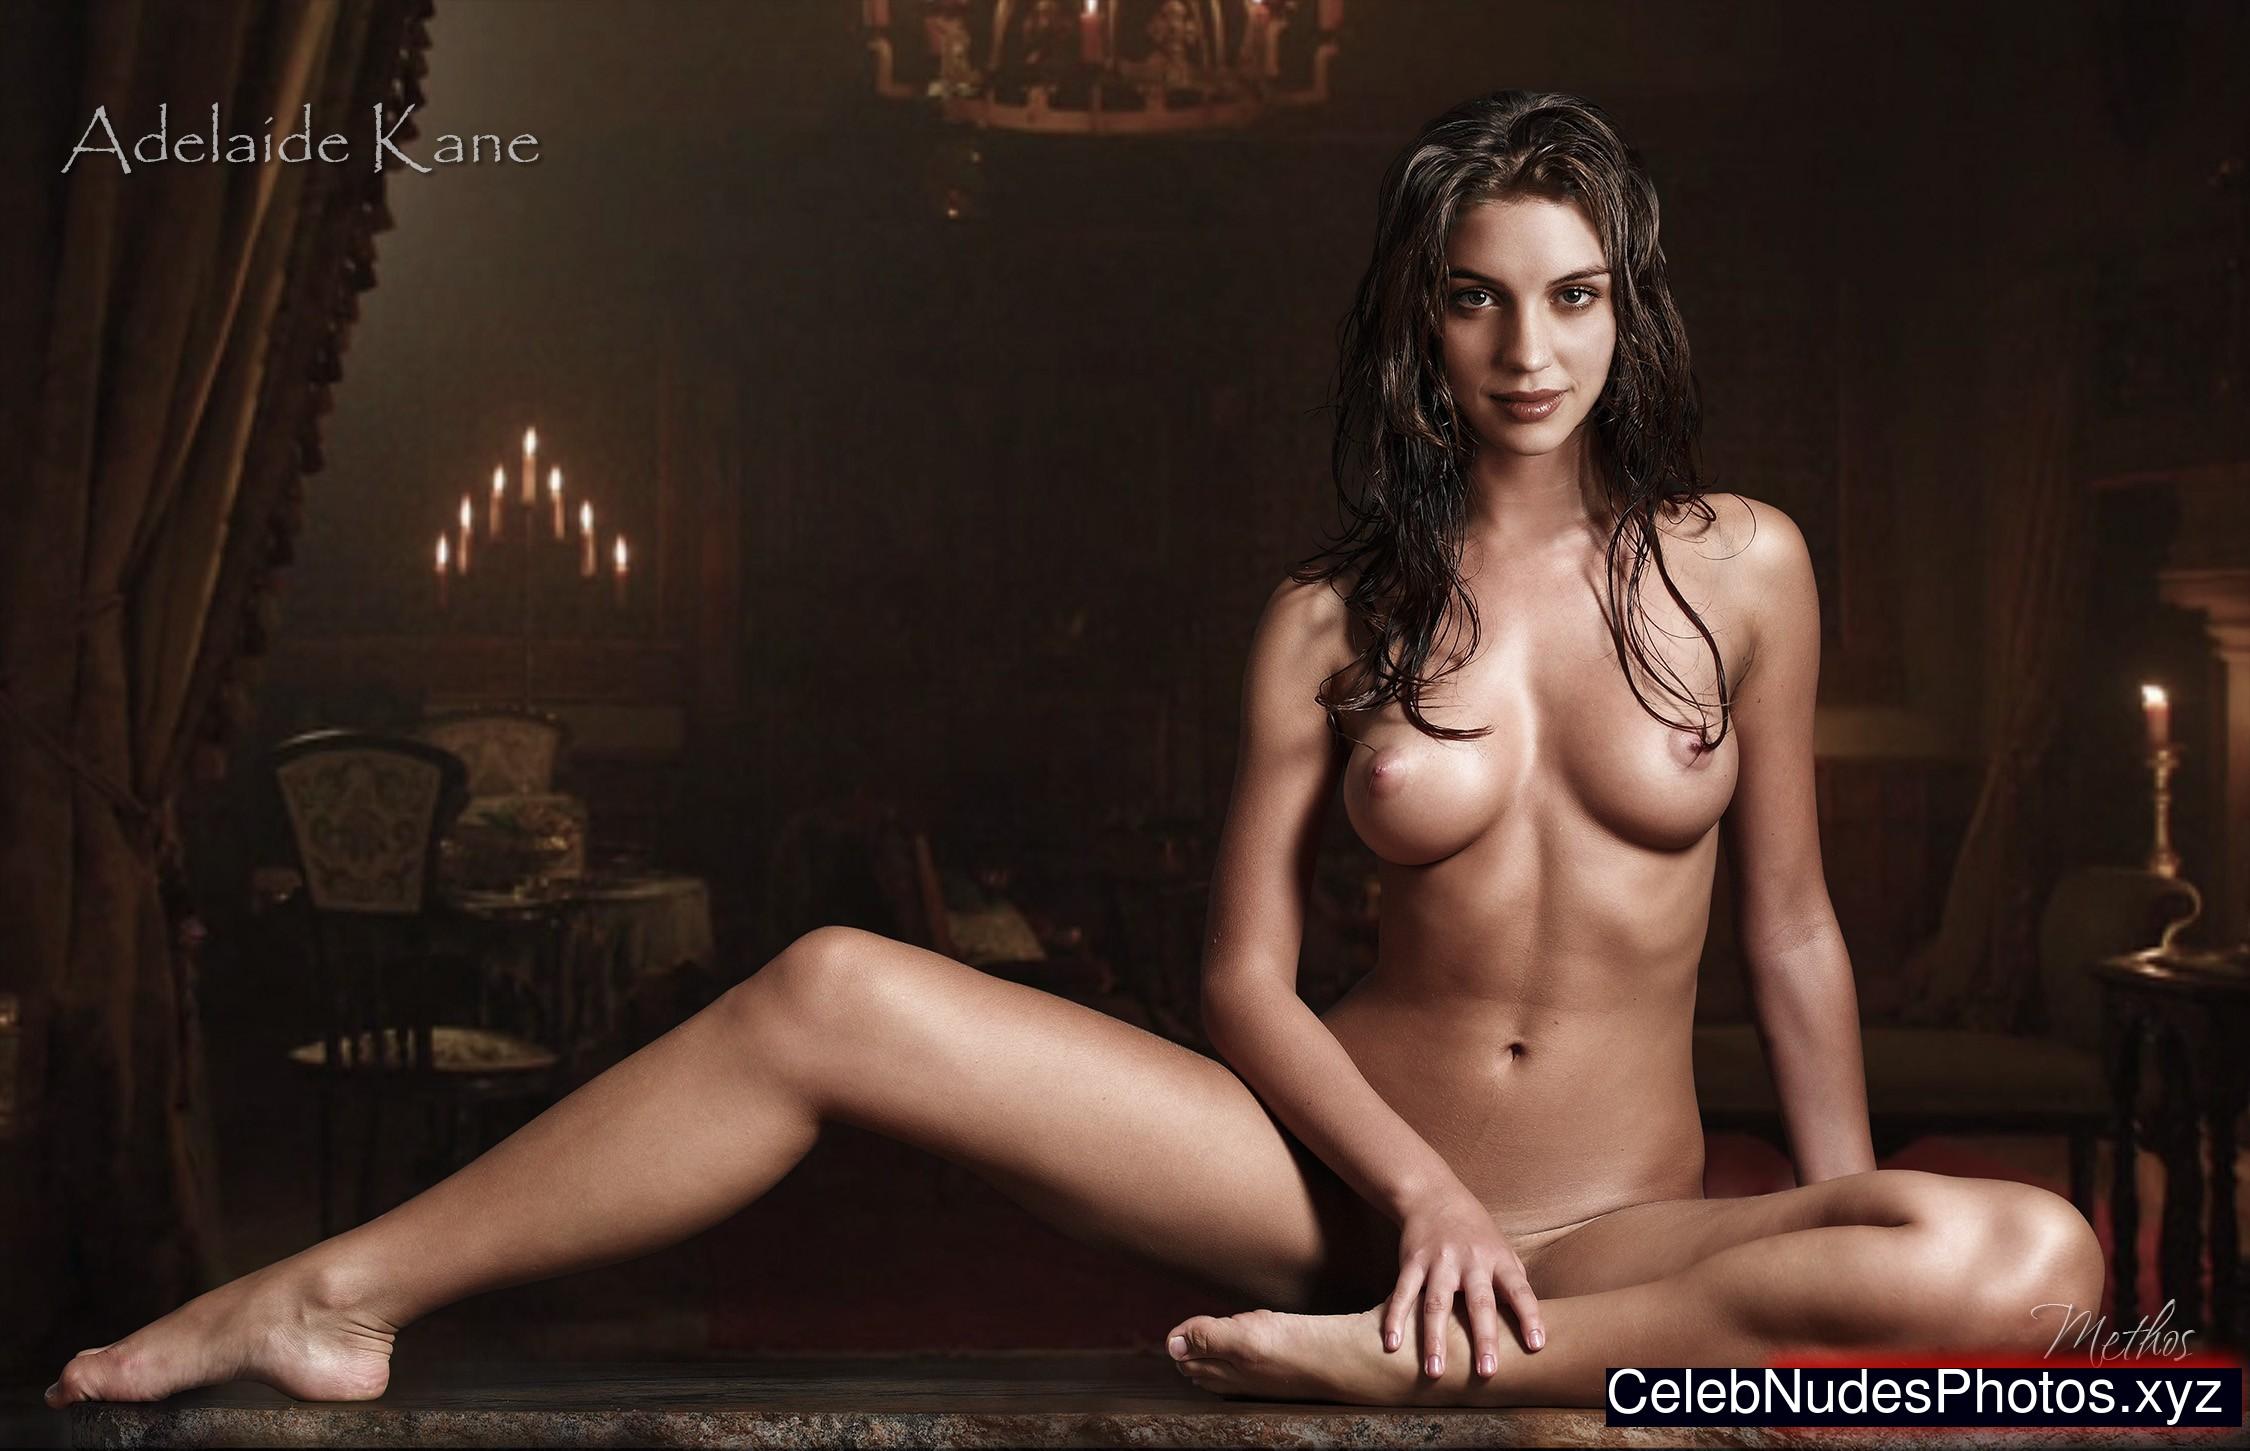 Adelaide Kane free nude celebs